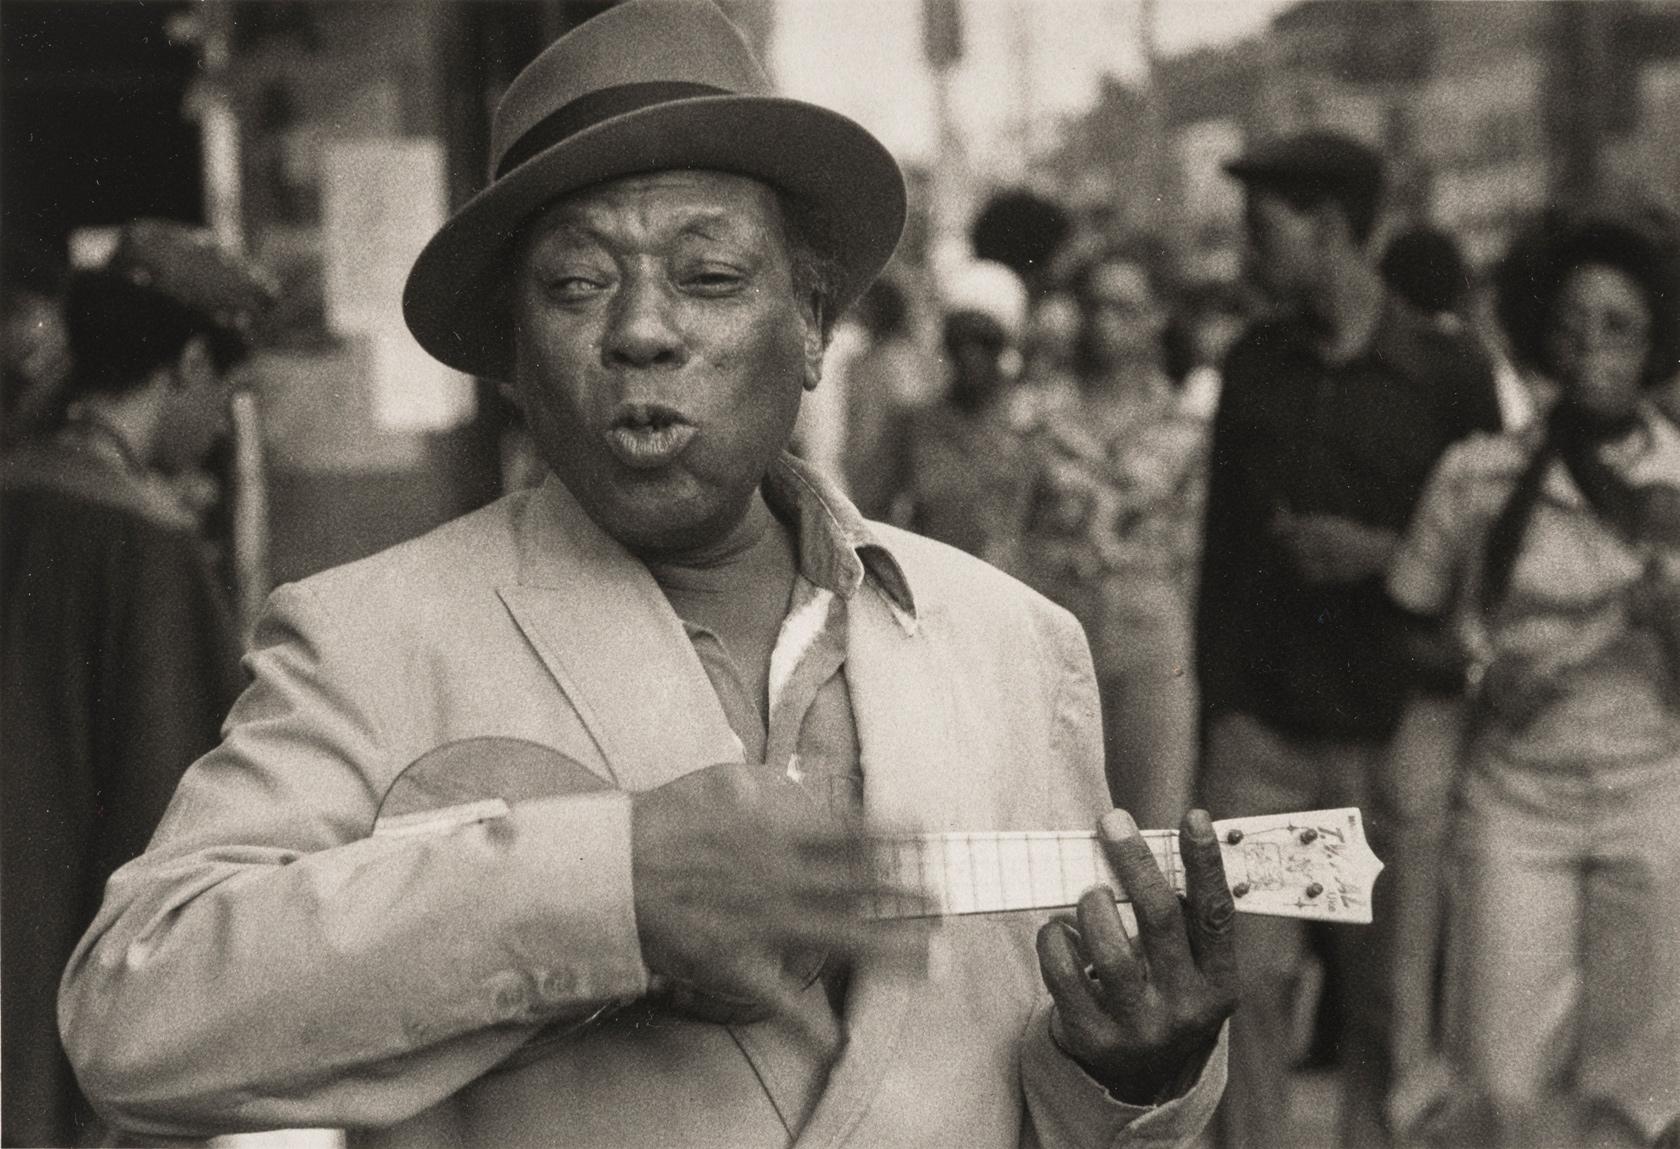 Dawoud Bey, 'A Man with a Ukelele,' Harlem USA, Courtesy of Dawoud Bey